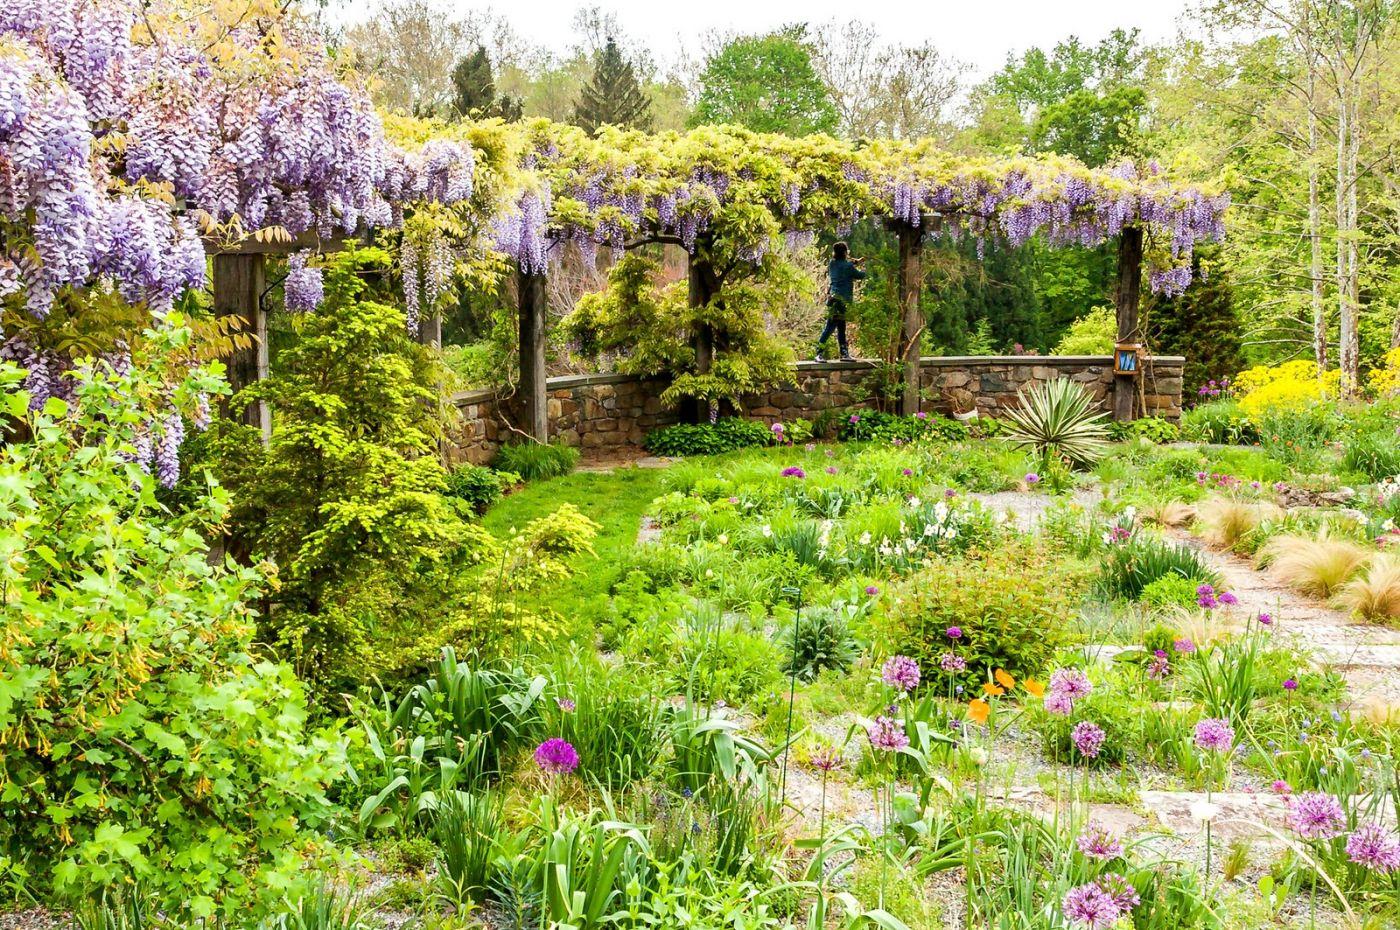 Chanticleer花园,那年盛开的紫藤花_图1-11